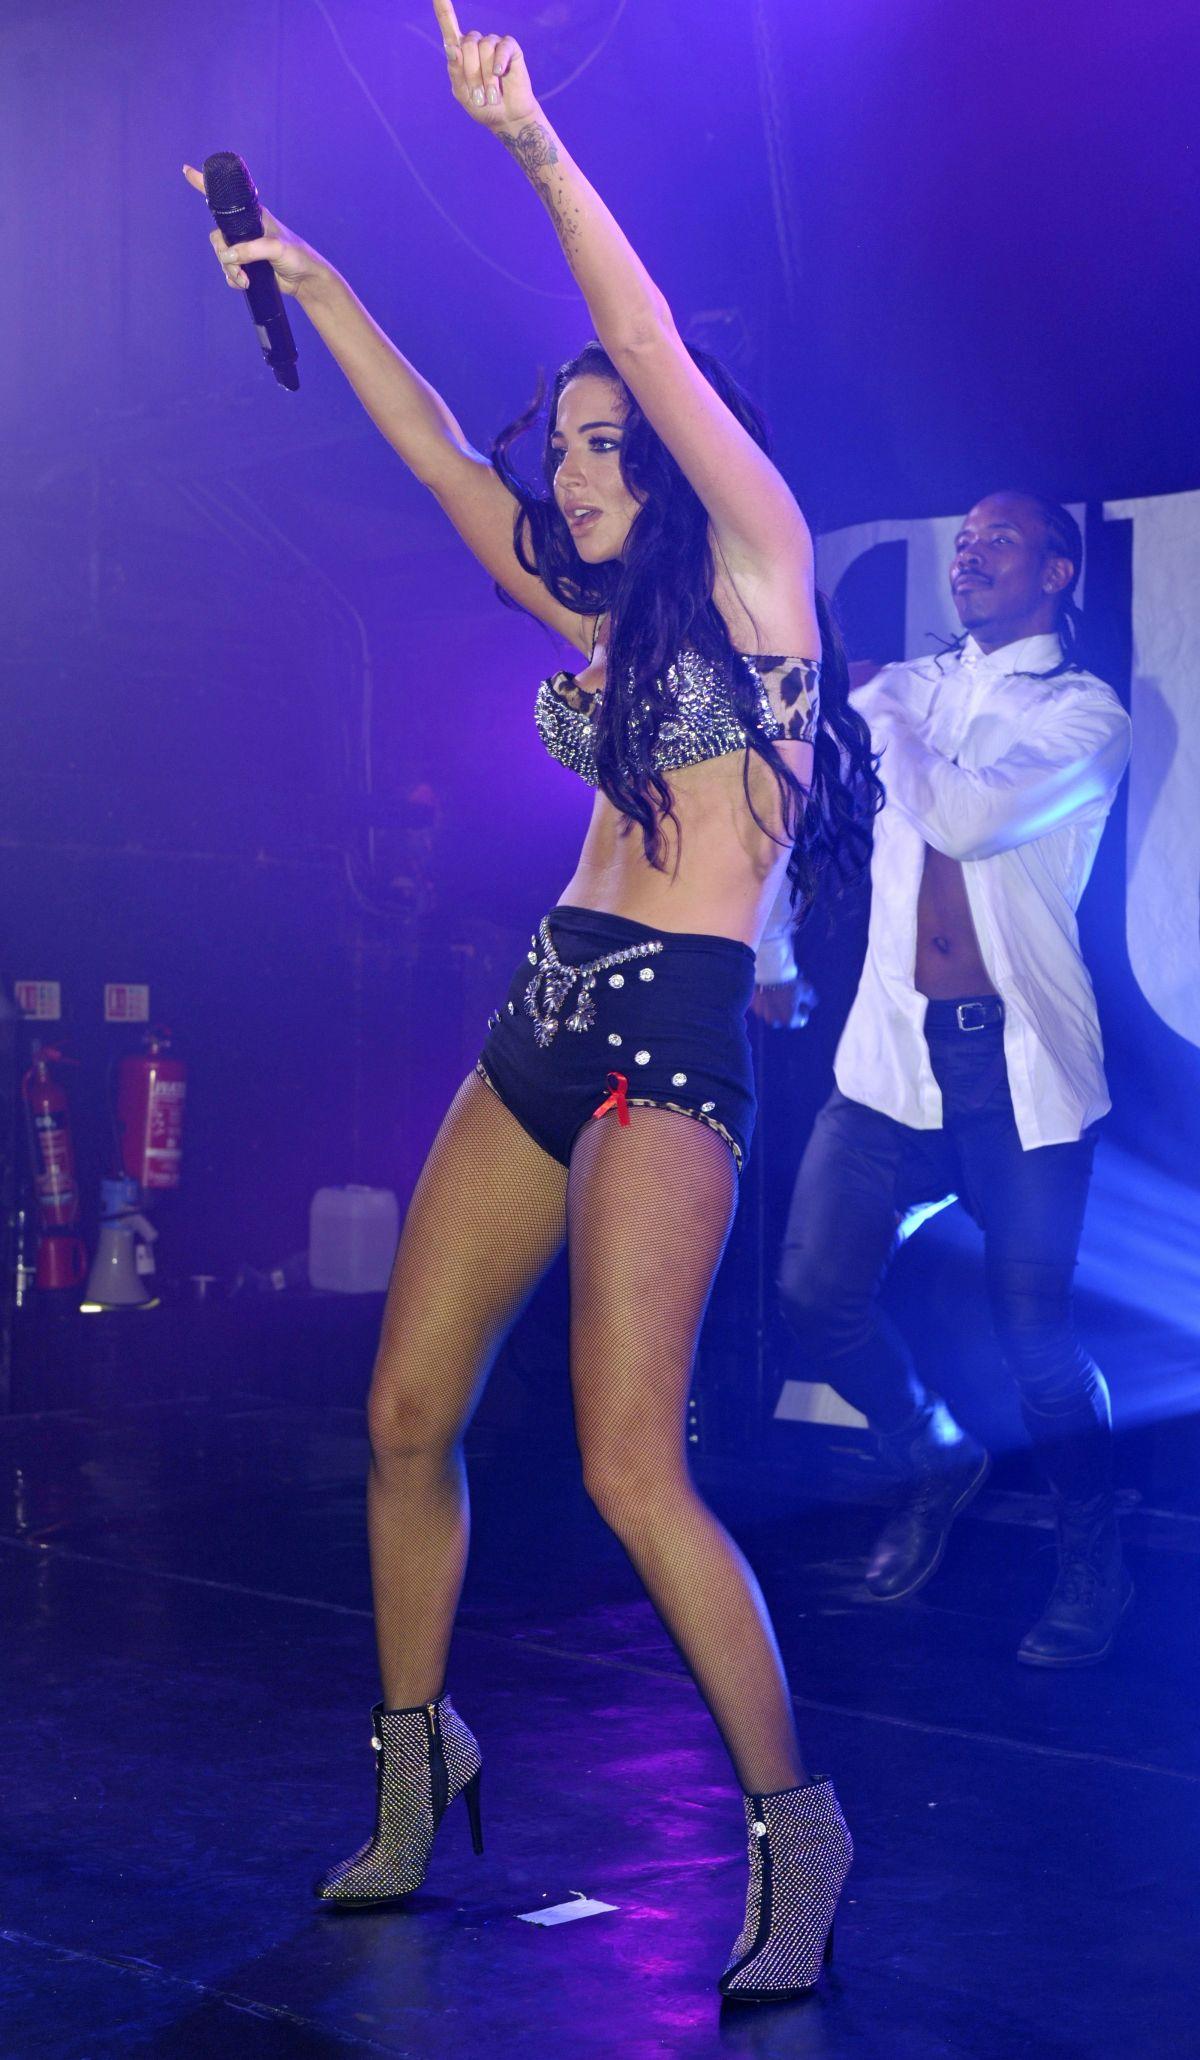 TULISA CONTOSTAVLOS Performs at G-A-Y Nightclub in London